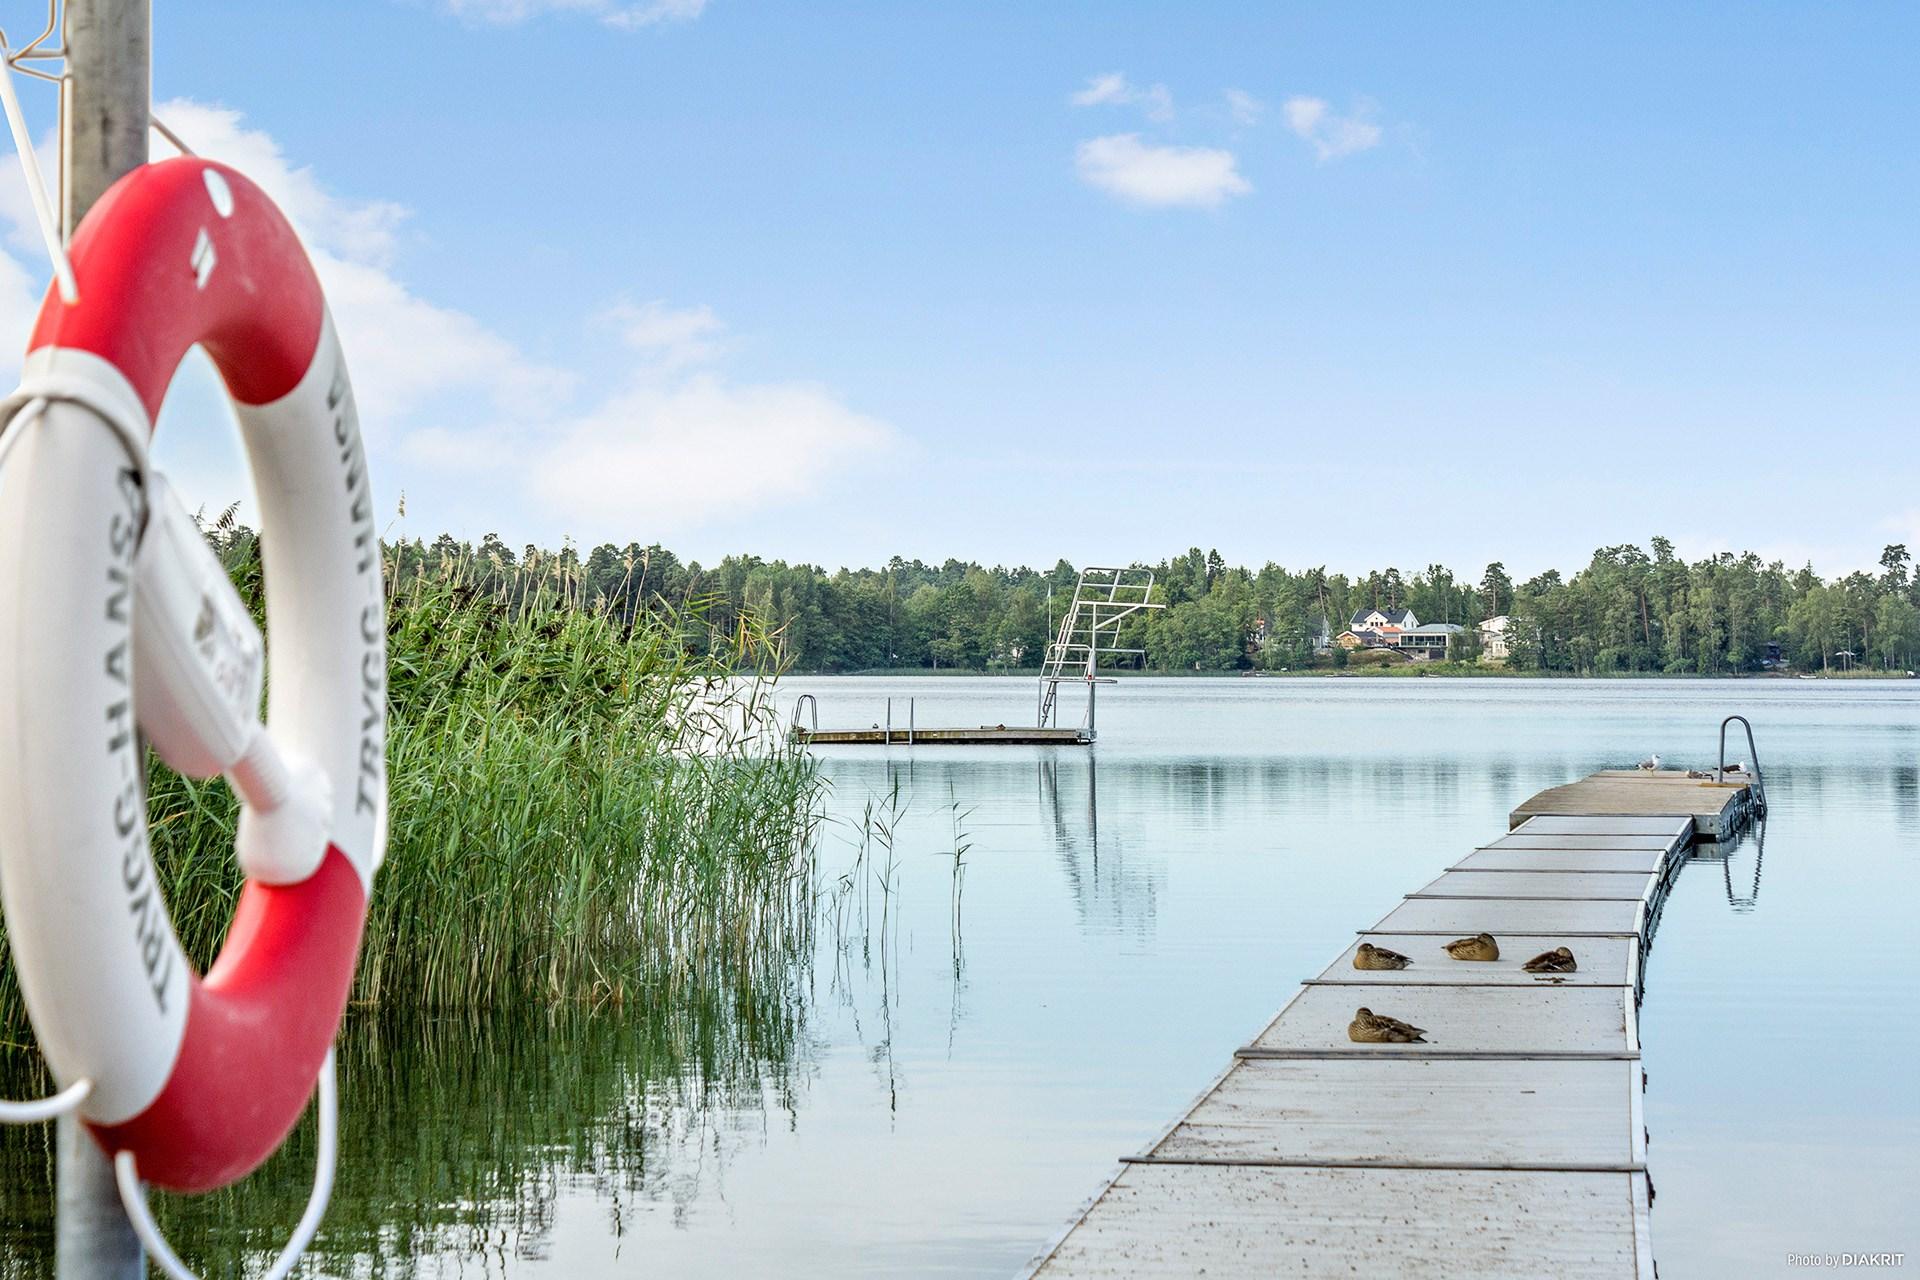 Badplats Lillsjön